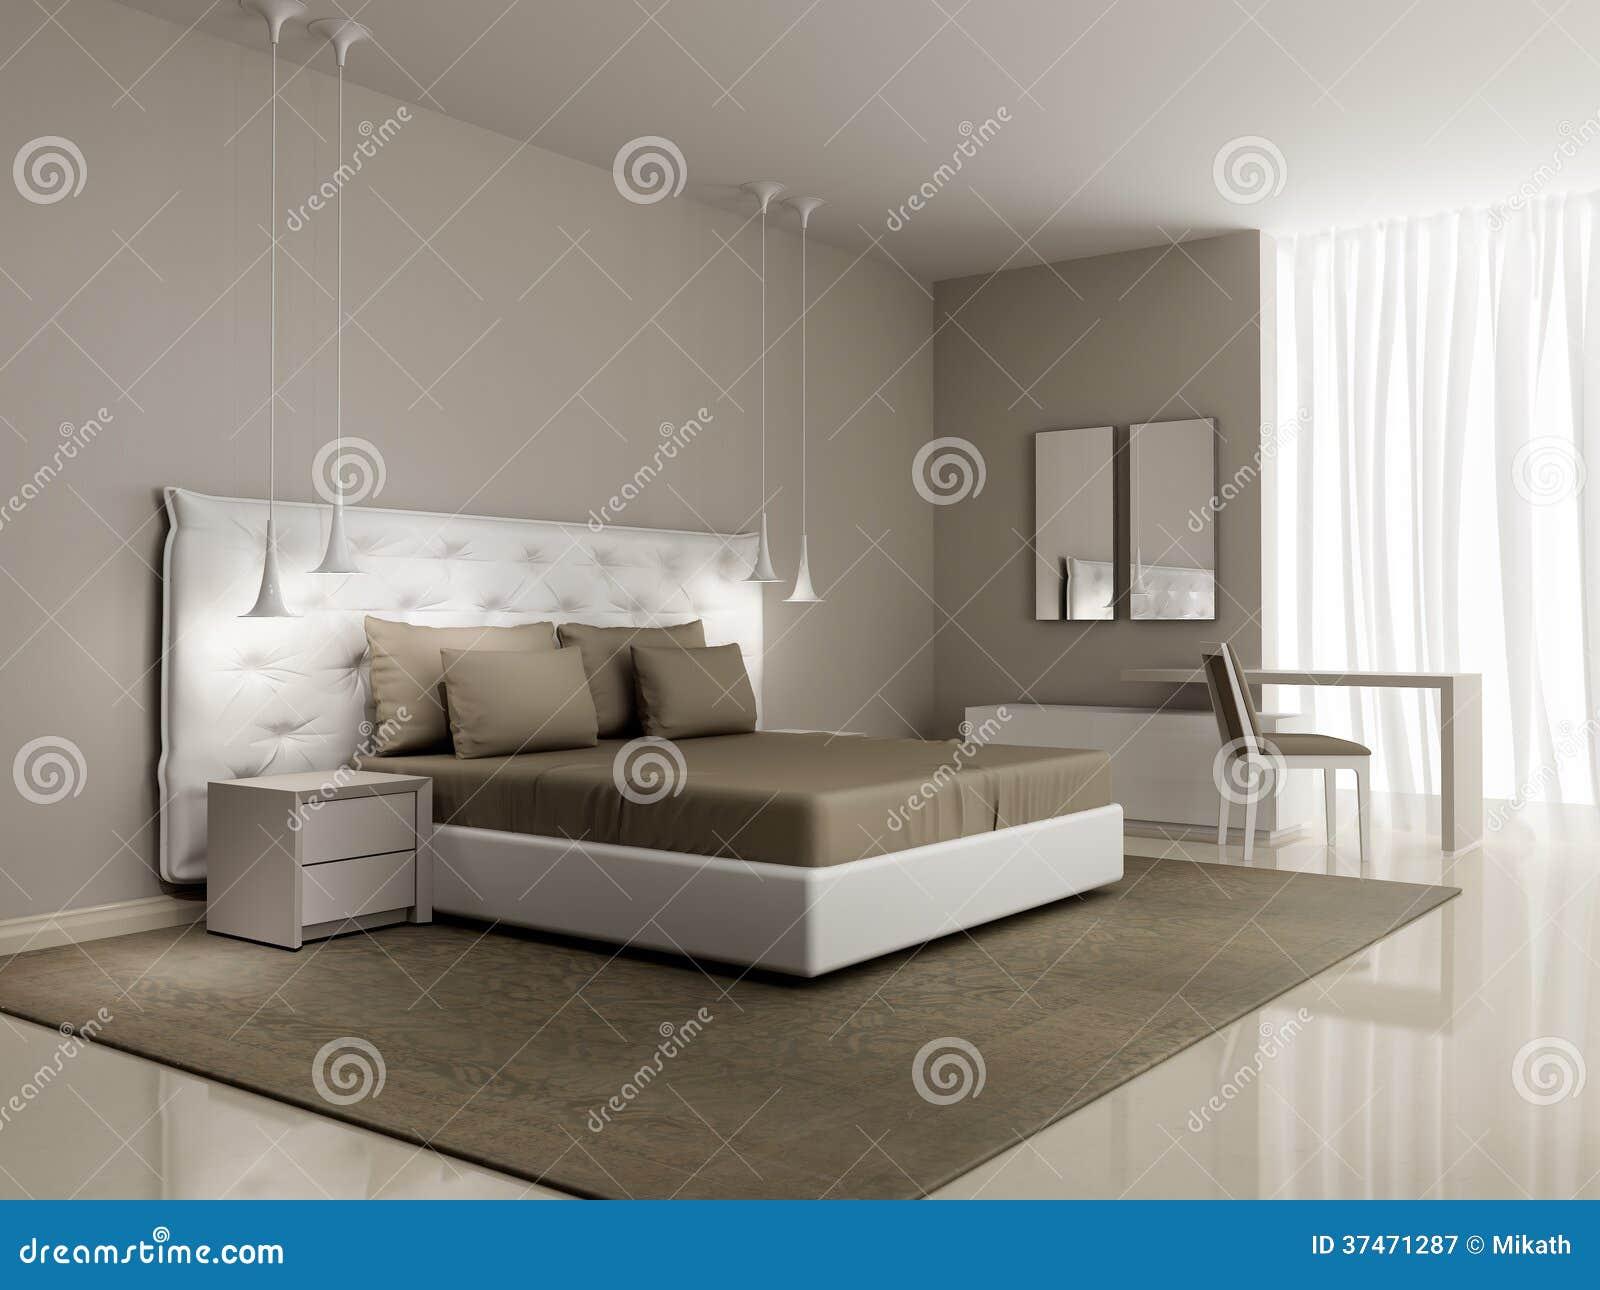 Chambre beige et blanche for Chambre a coucher blanche